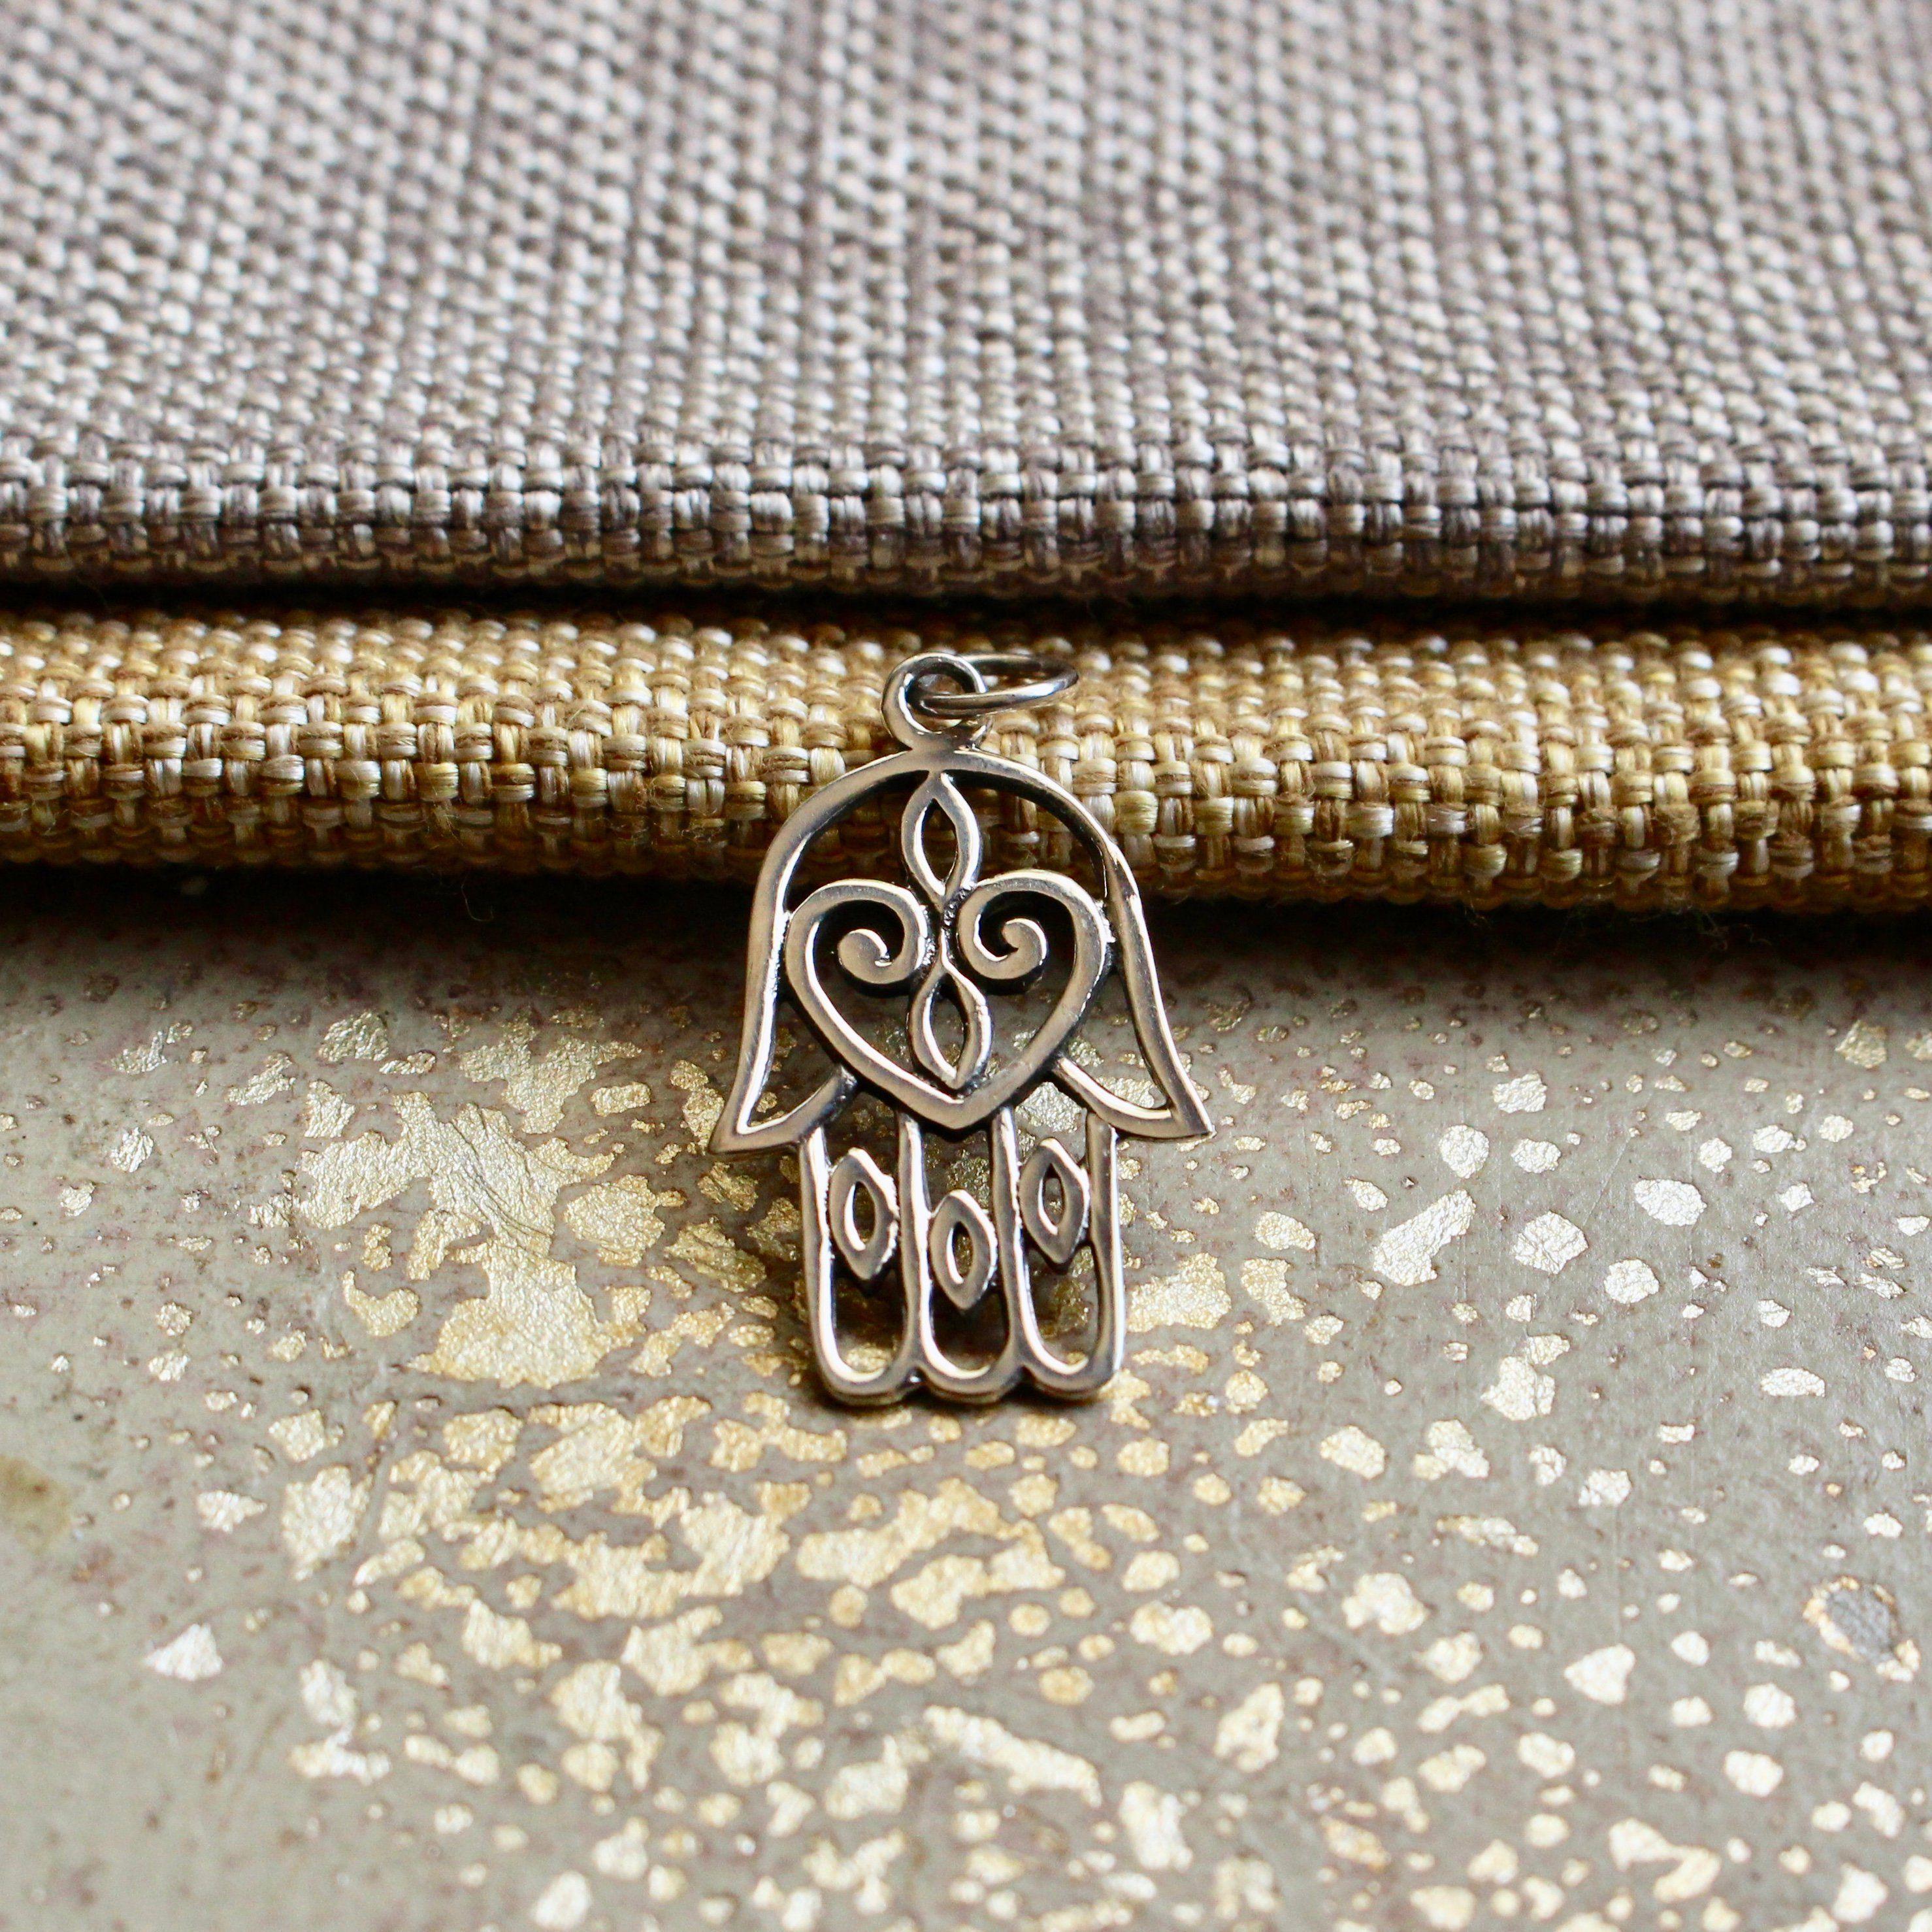 Pendant Necklace Gift Hamsa Hand Of Fatima Spiritual Yoga 925 Sterling Silver